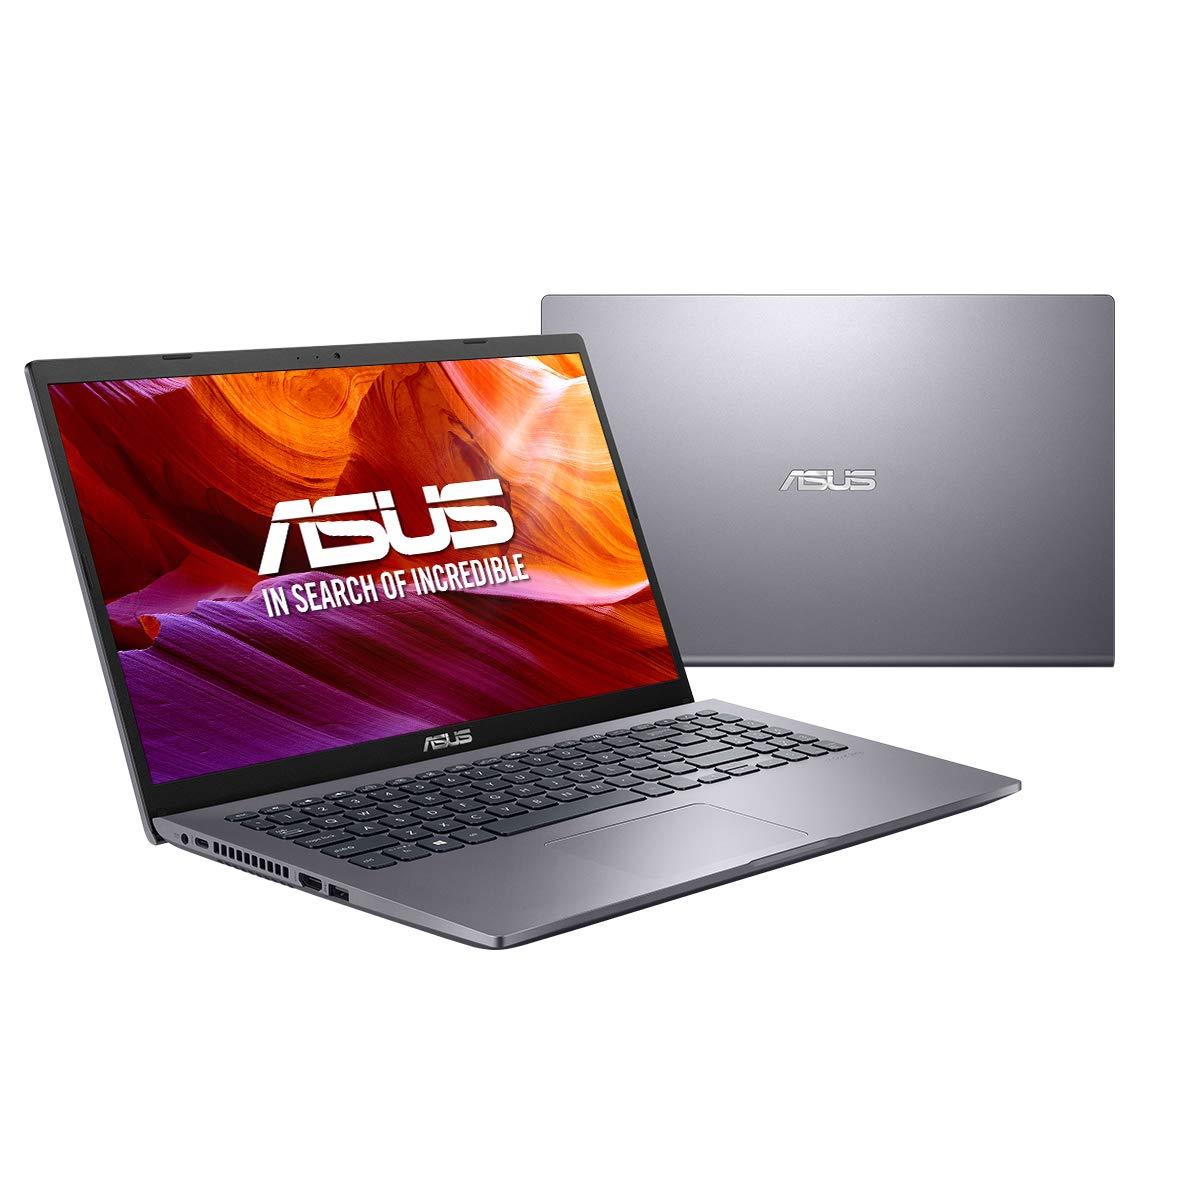 Asus Ryzen 7 FHD 512GB SSD solo 439€